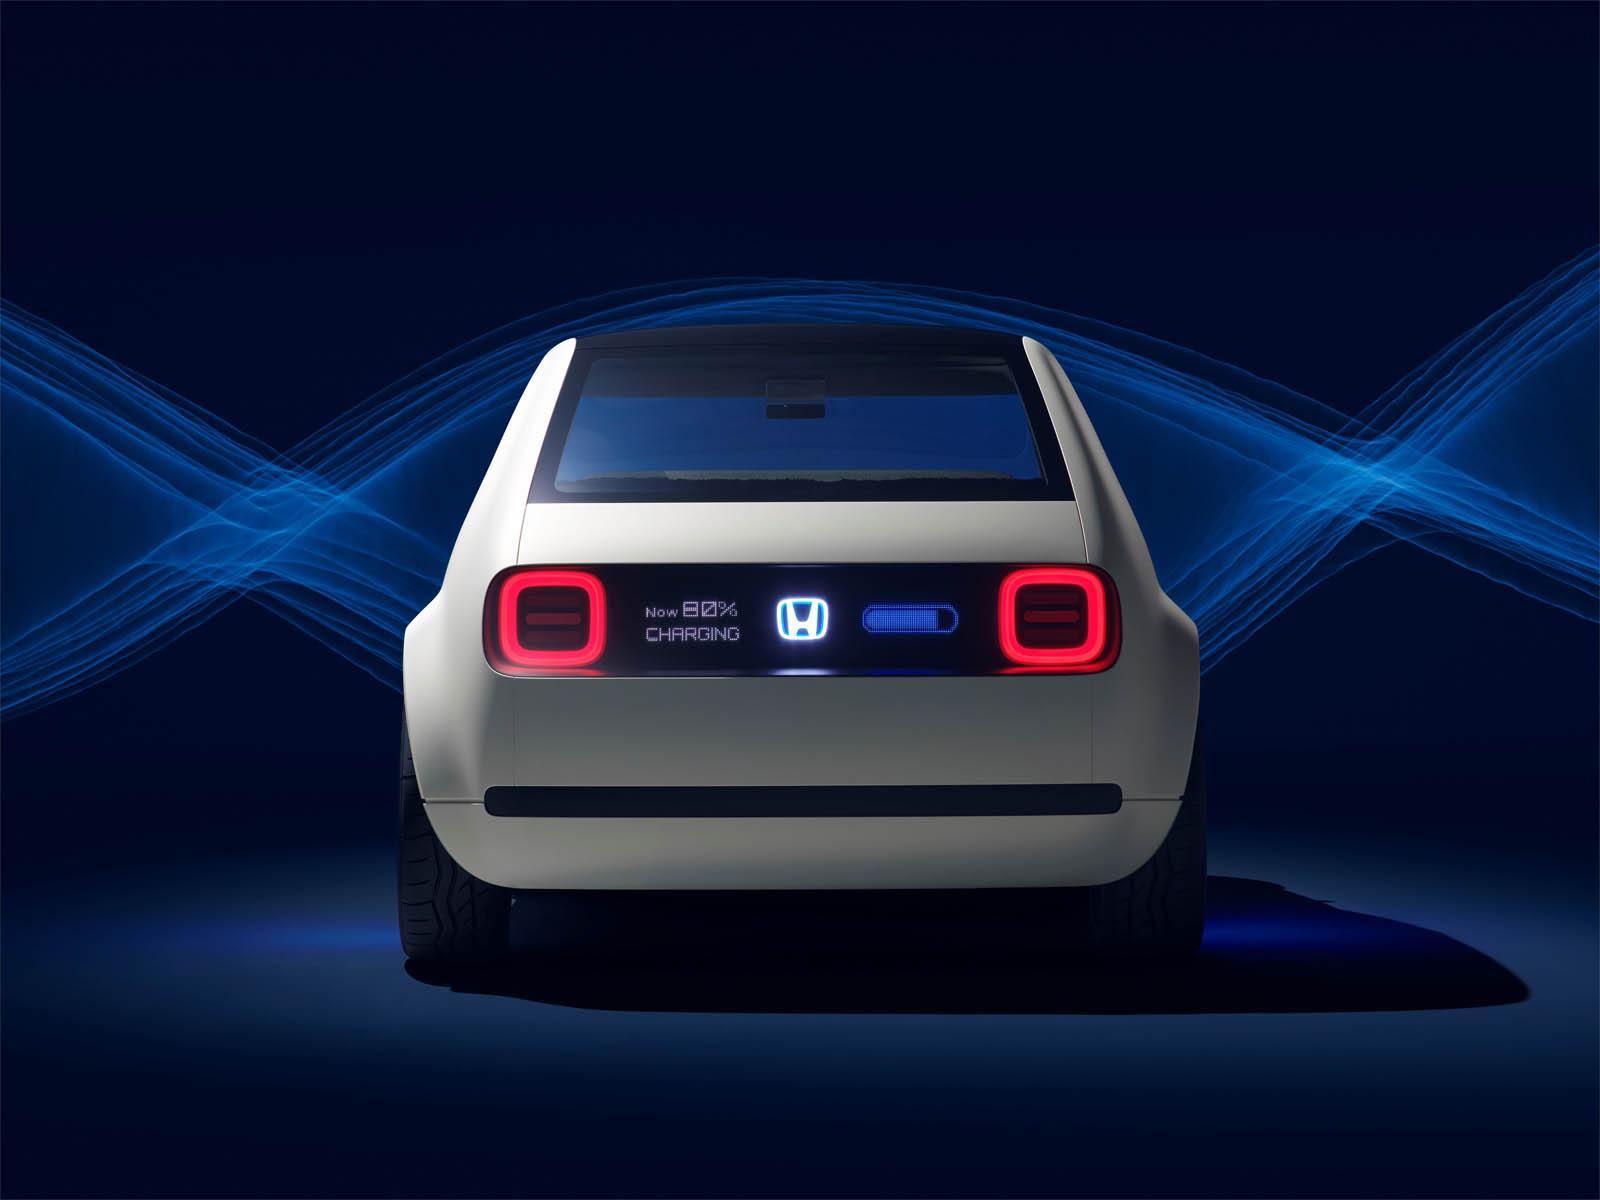 113874_Honda_Urban_EV_Concept_unveiled_at_the_Frankfurt_Motor_Show%2Bcopy.jpg